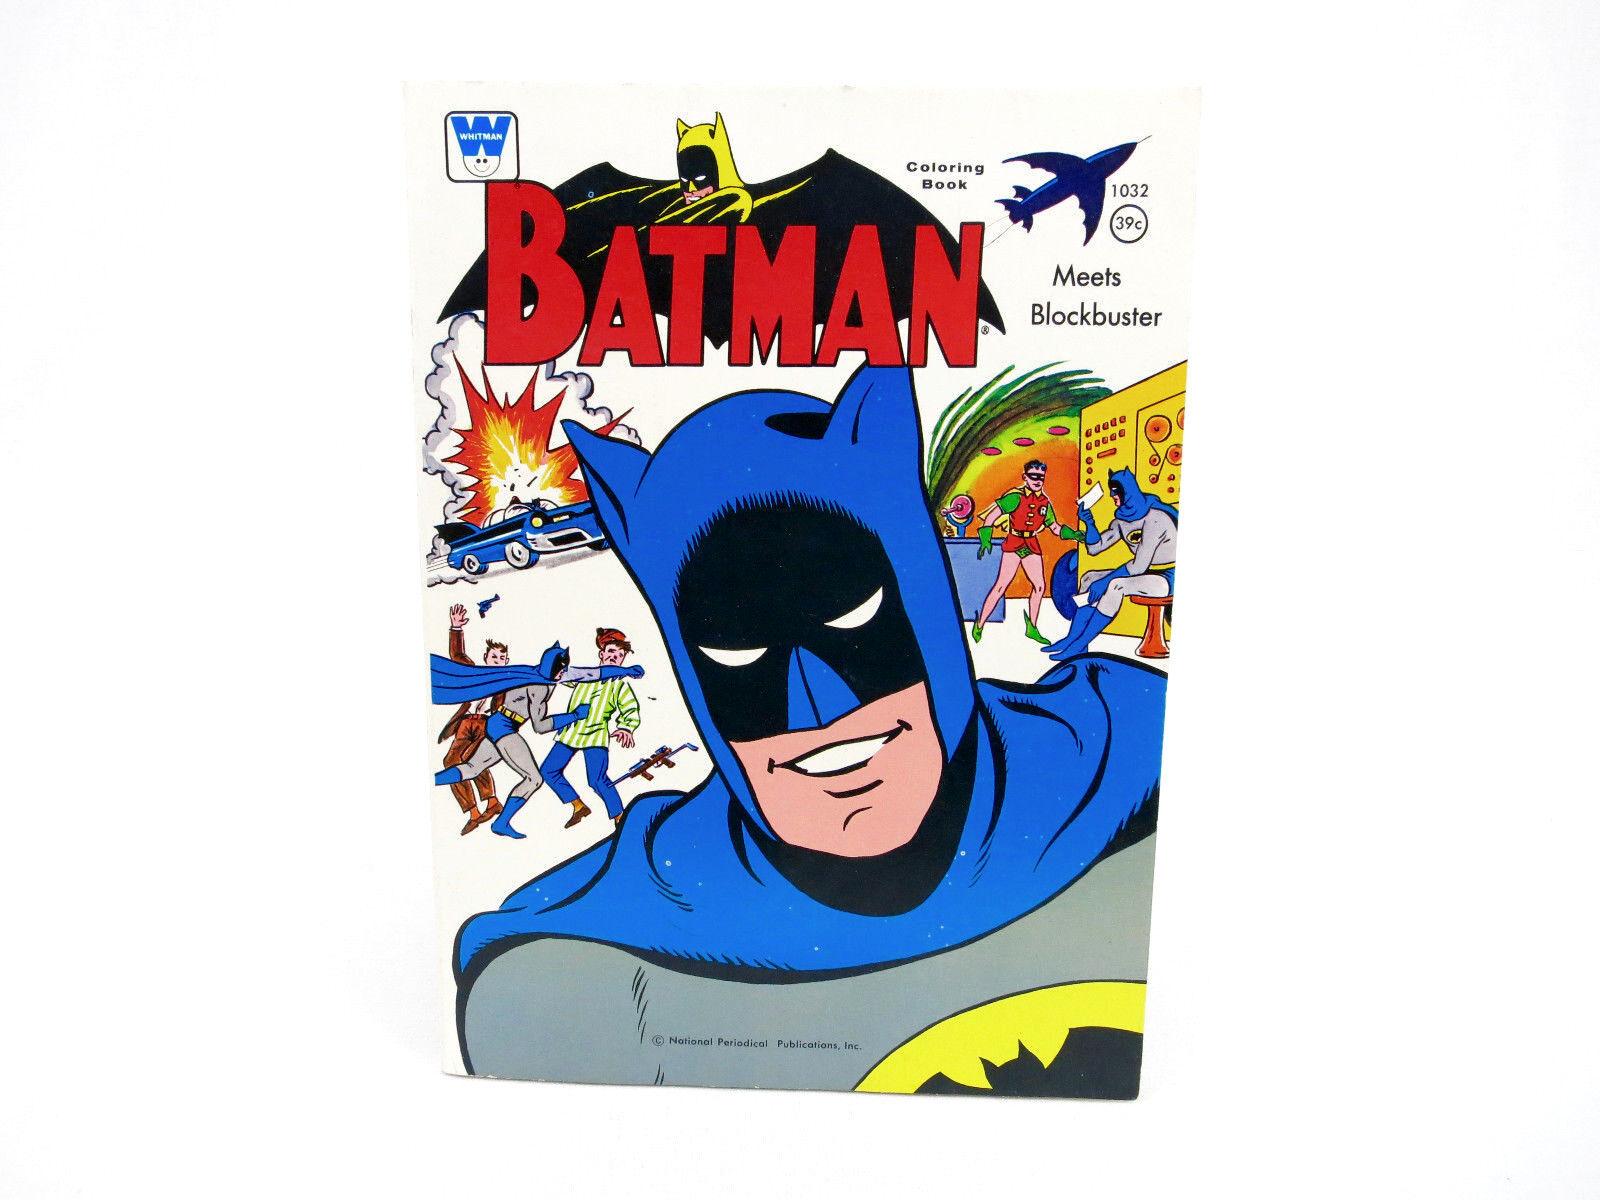 Vintage Batman & Robin coloring Comic Book No. 1032 Batmobile Toy Whitman NICE